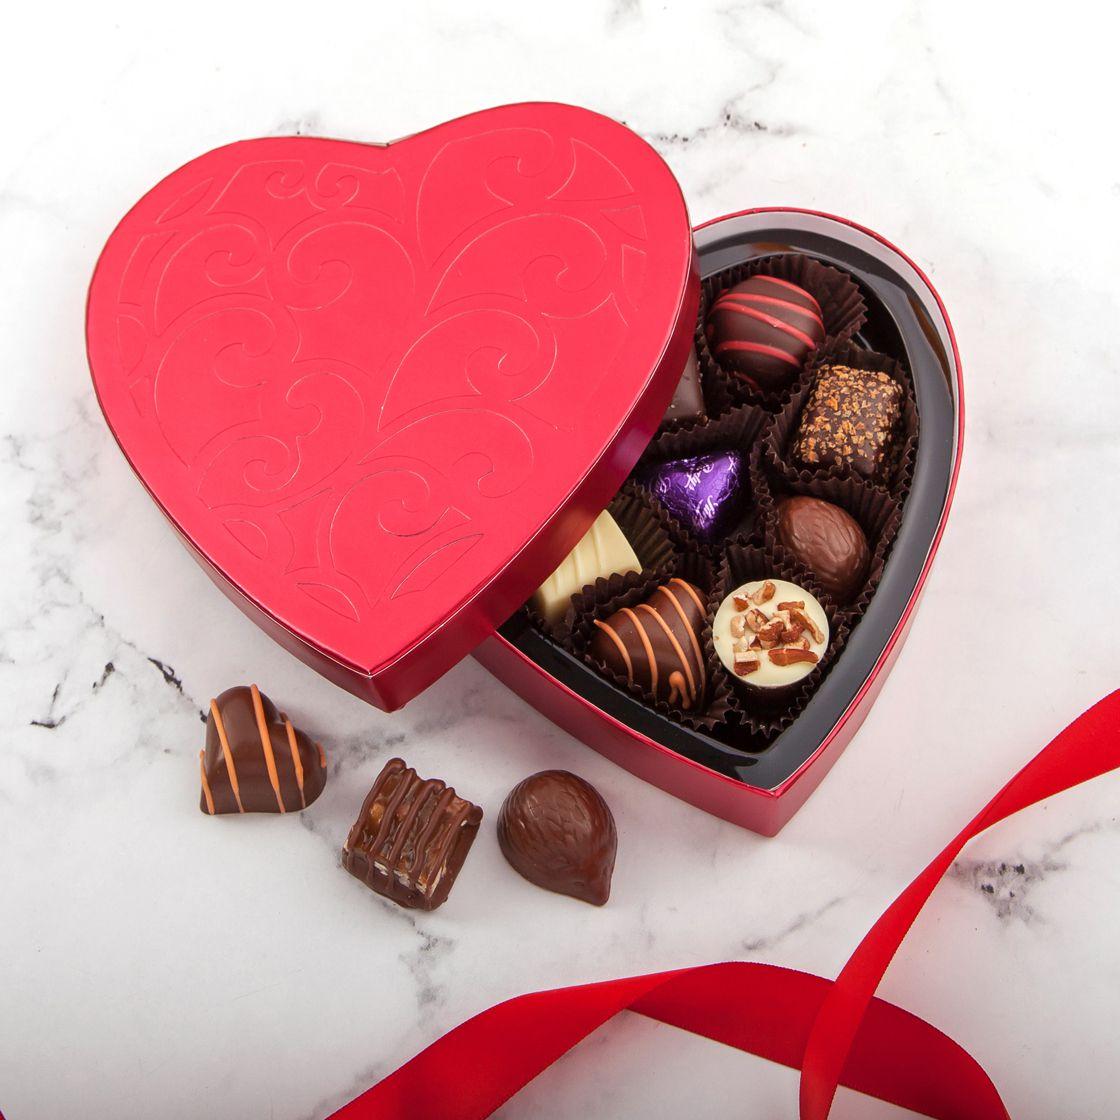 Purdys: Milk & Dark Chocolate Heartfelt Box Just $21